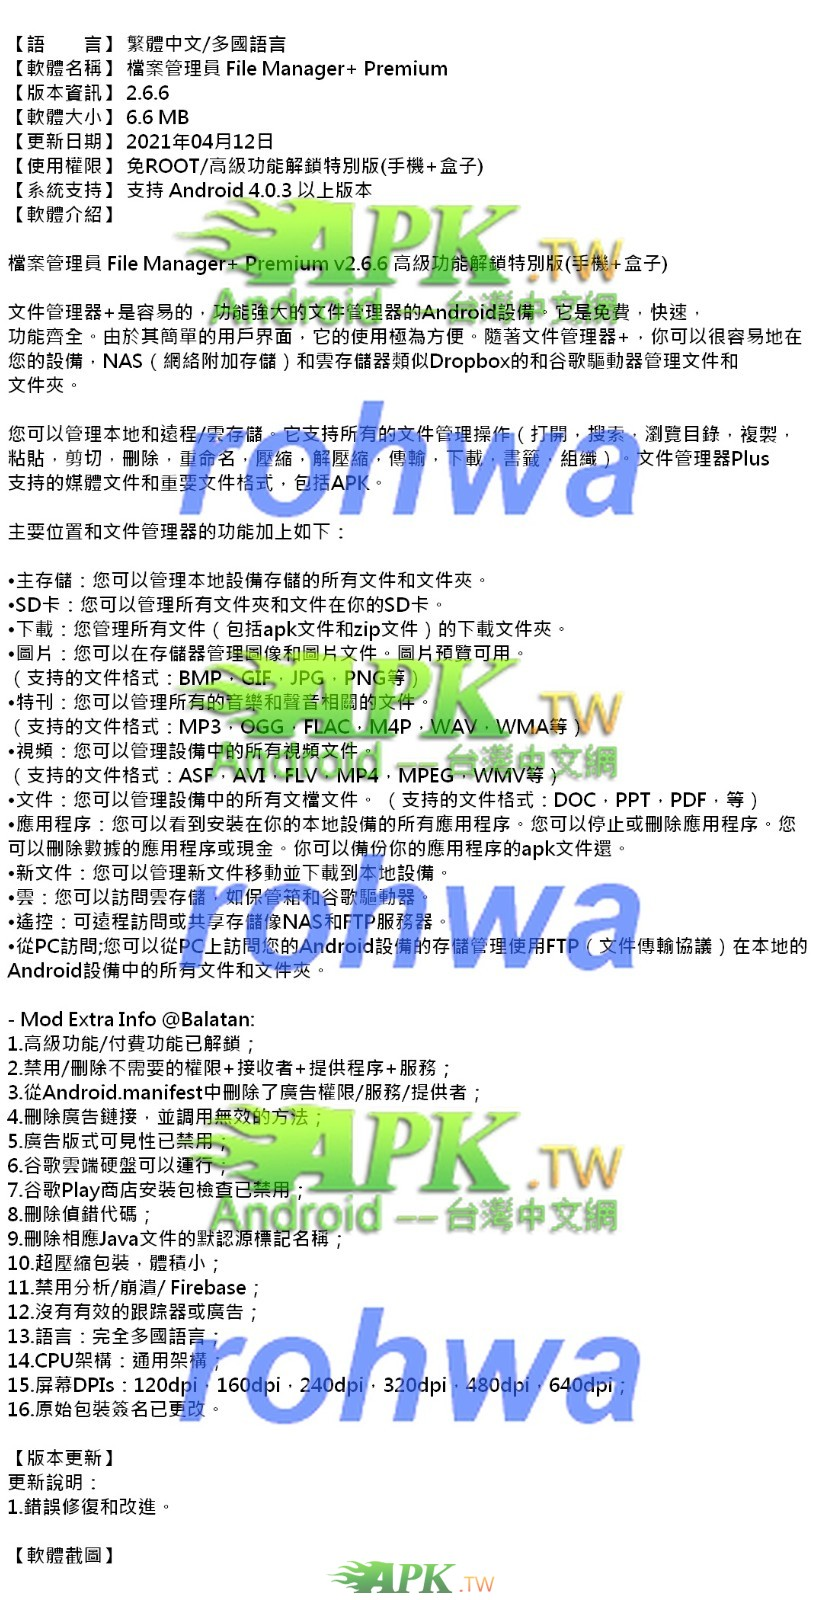 FileManager_Premium_2.6.6_.jpg